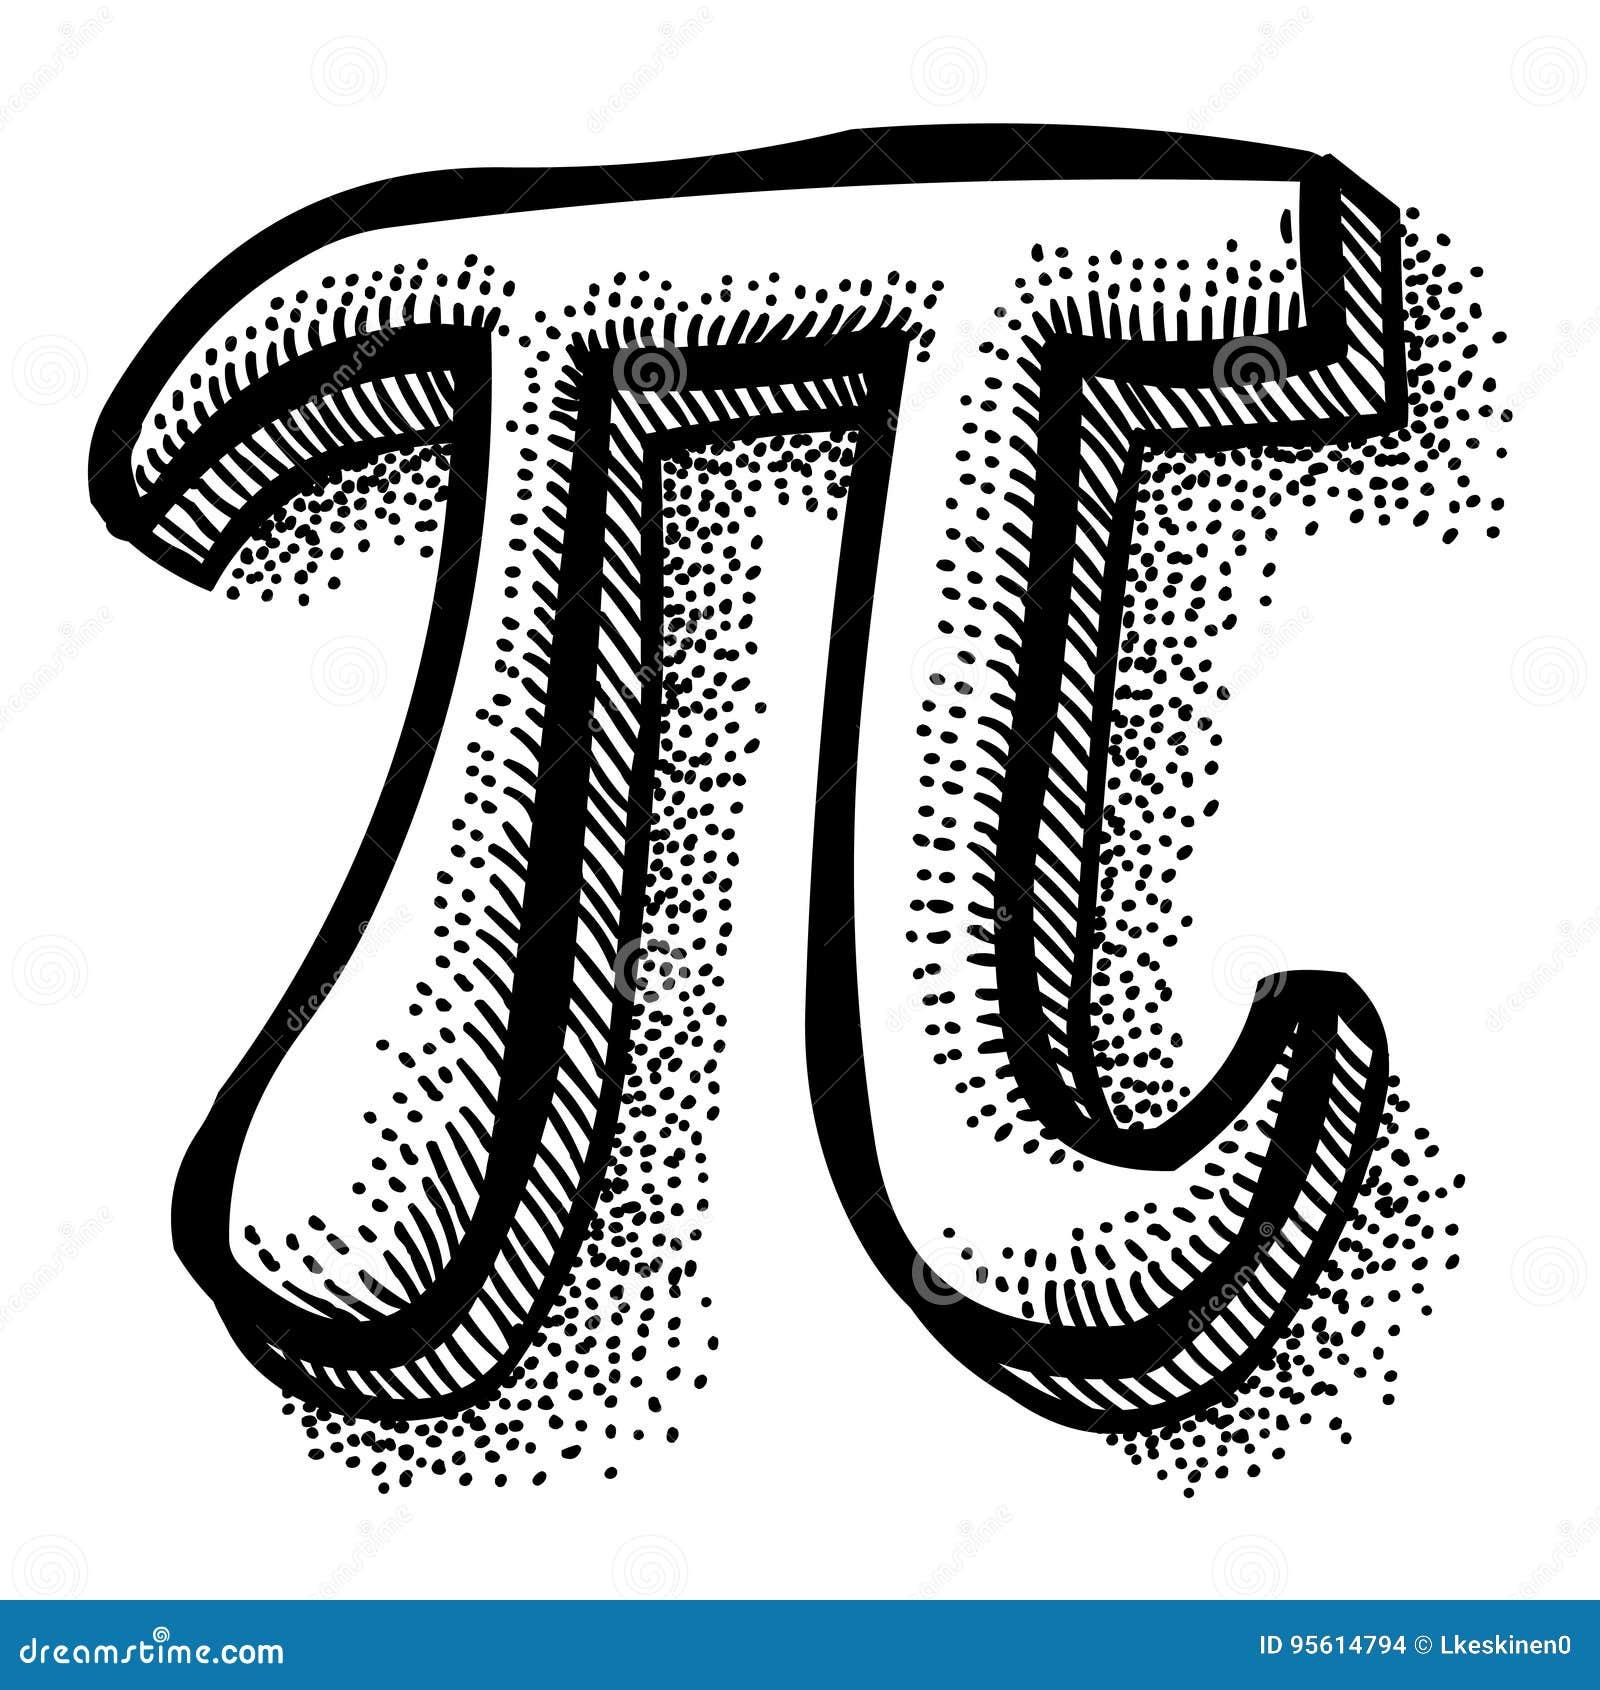 Cartoon Image Of Pi Symbol Stock Vector Illustration Of Engineering